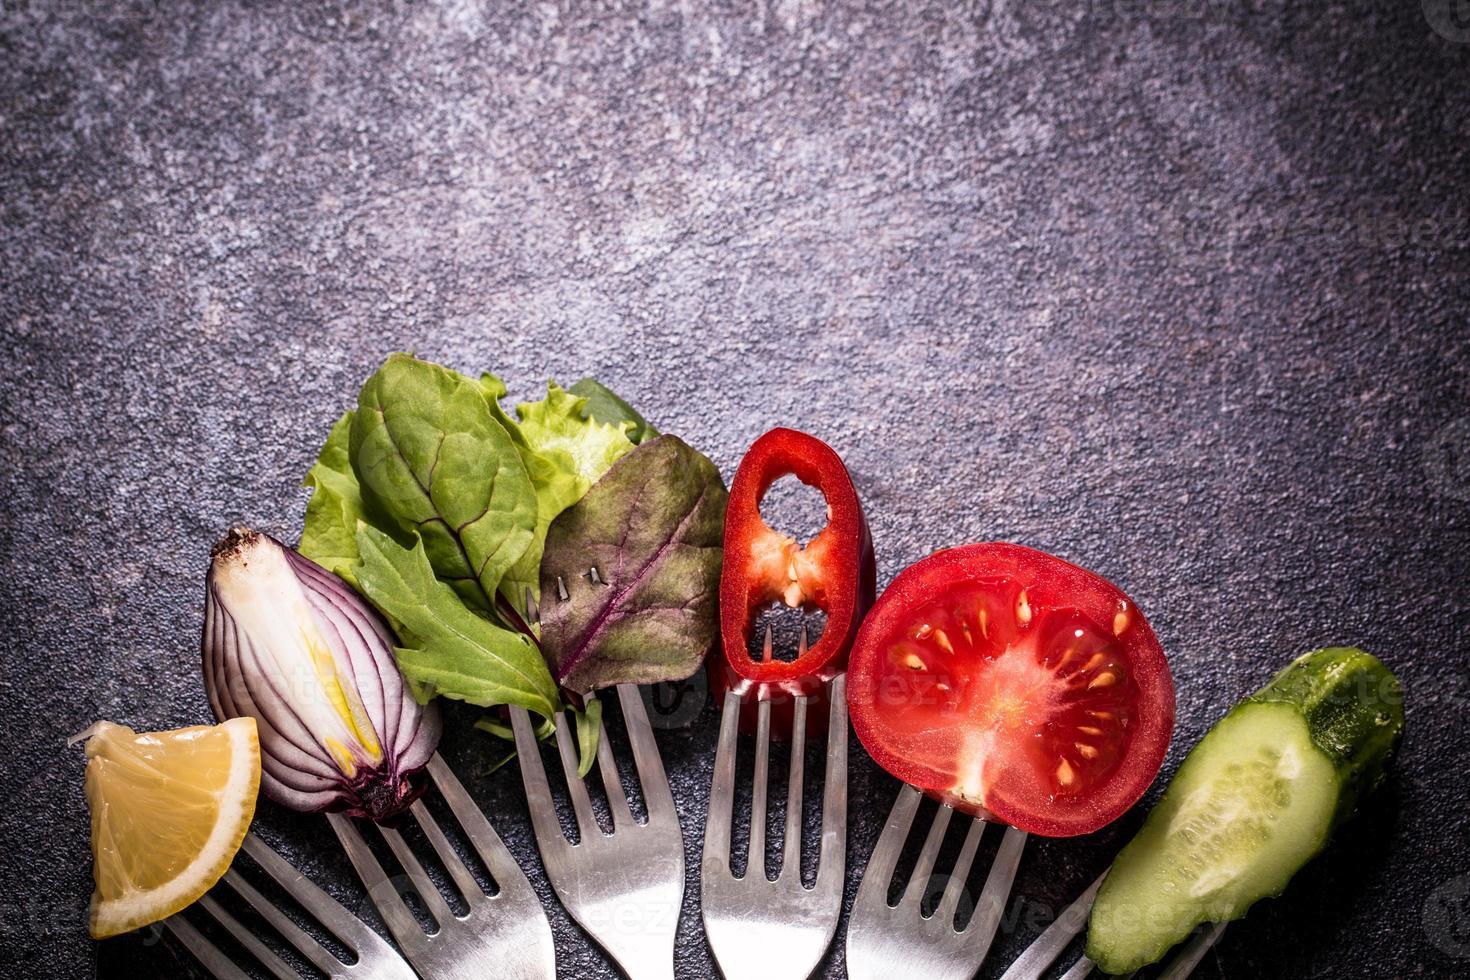 Vegetables on fork photo